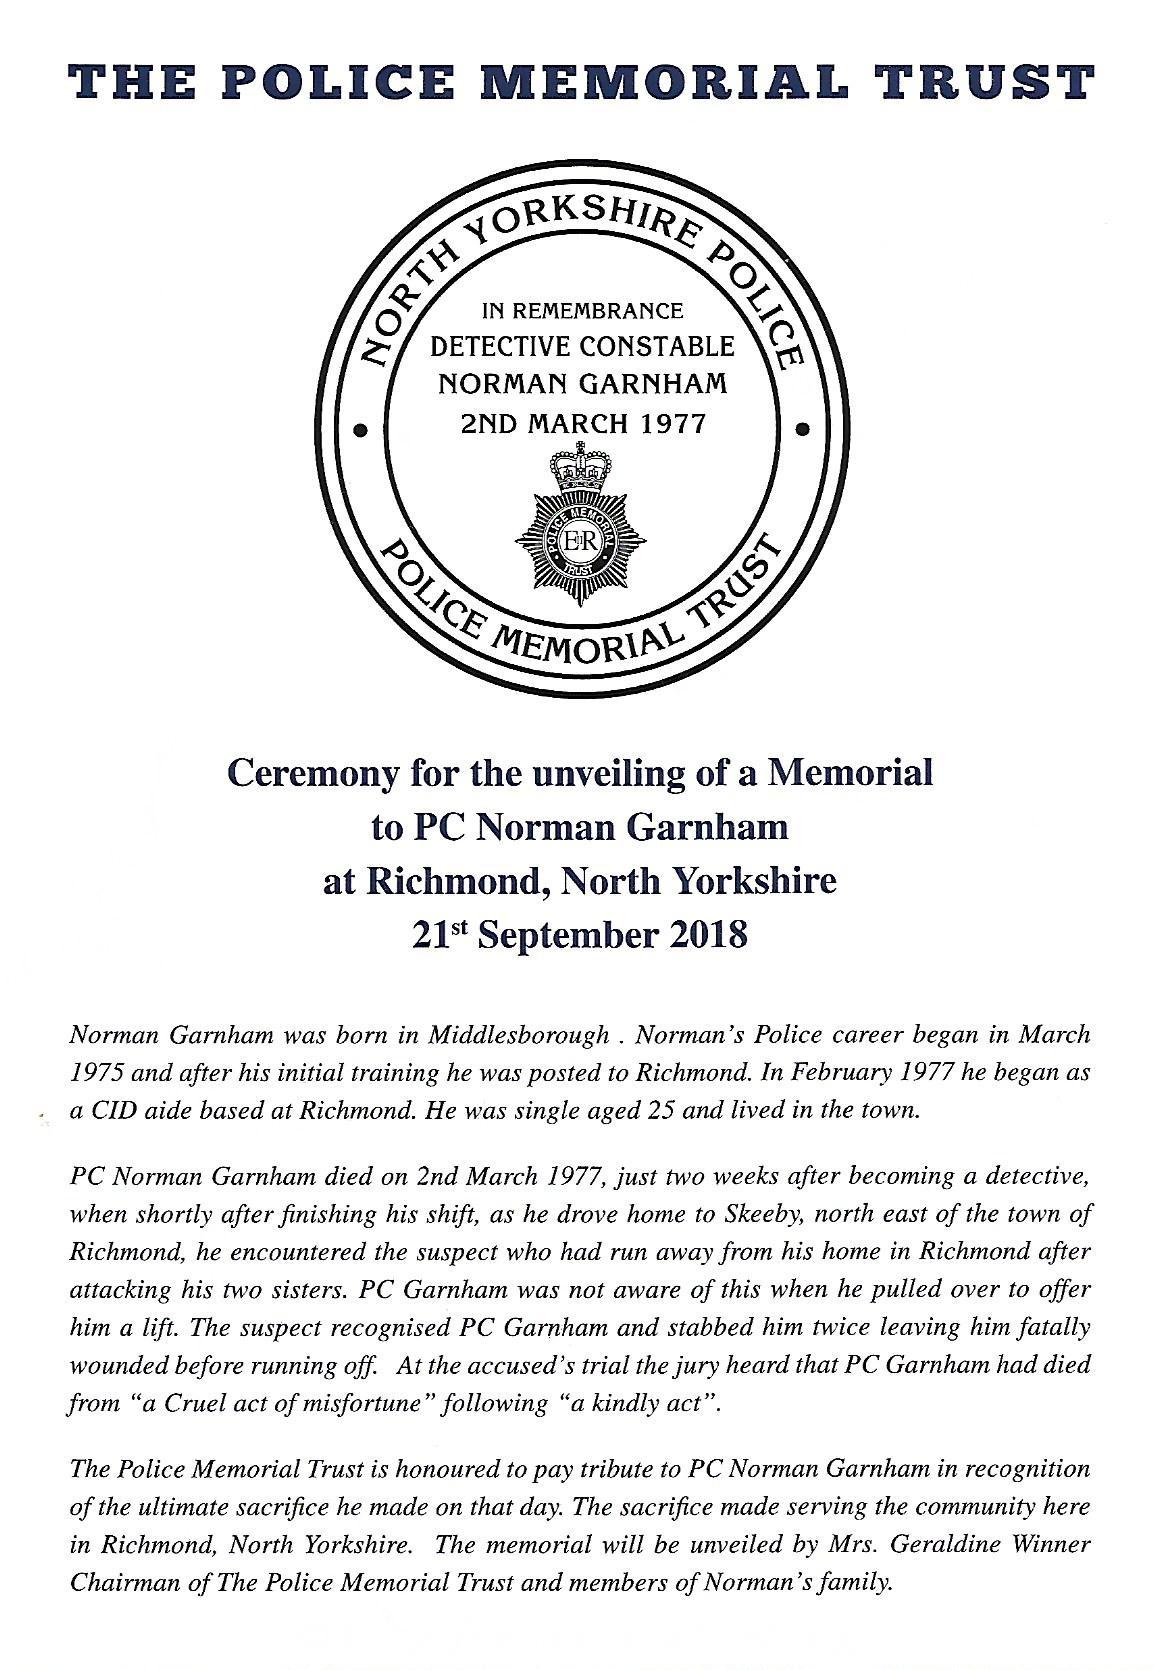 Ceremony for the unveiling of a Memorial to DC Norman Garnham